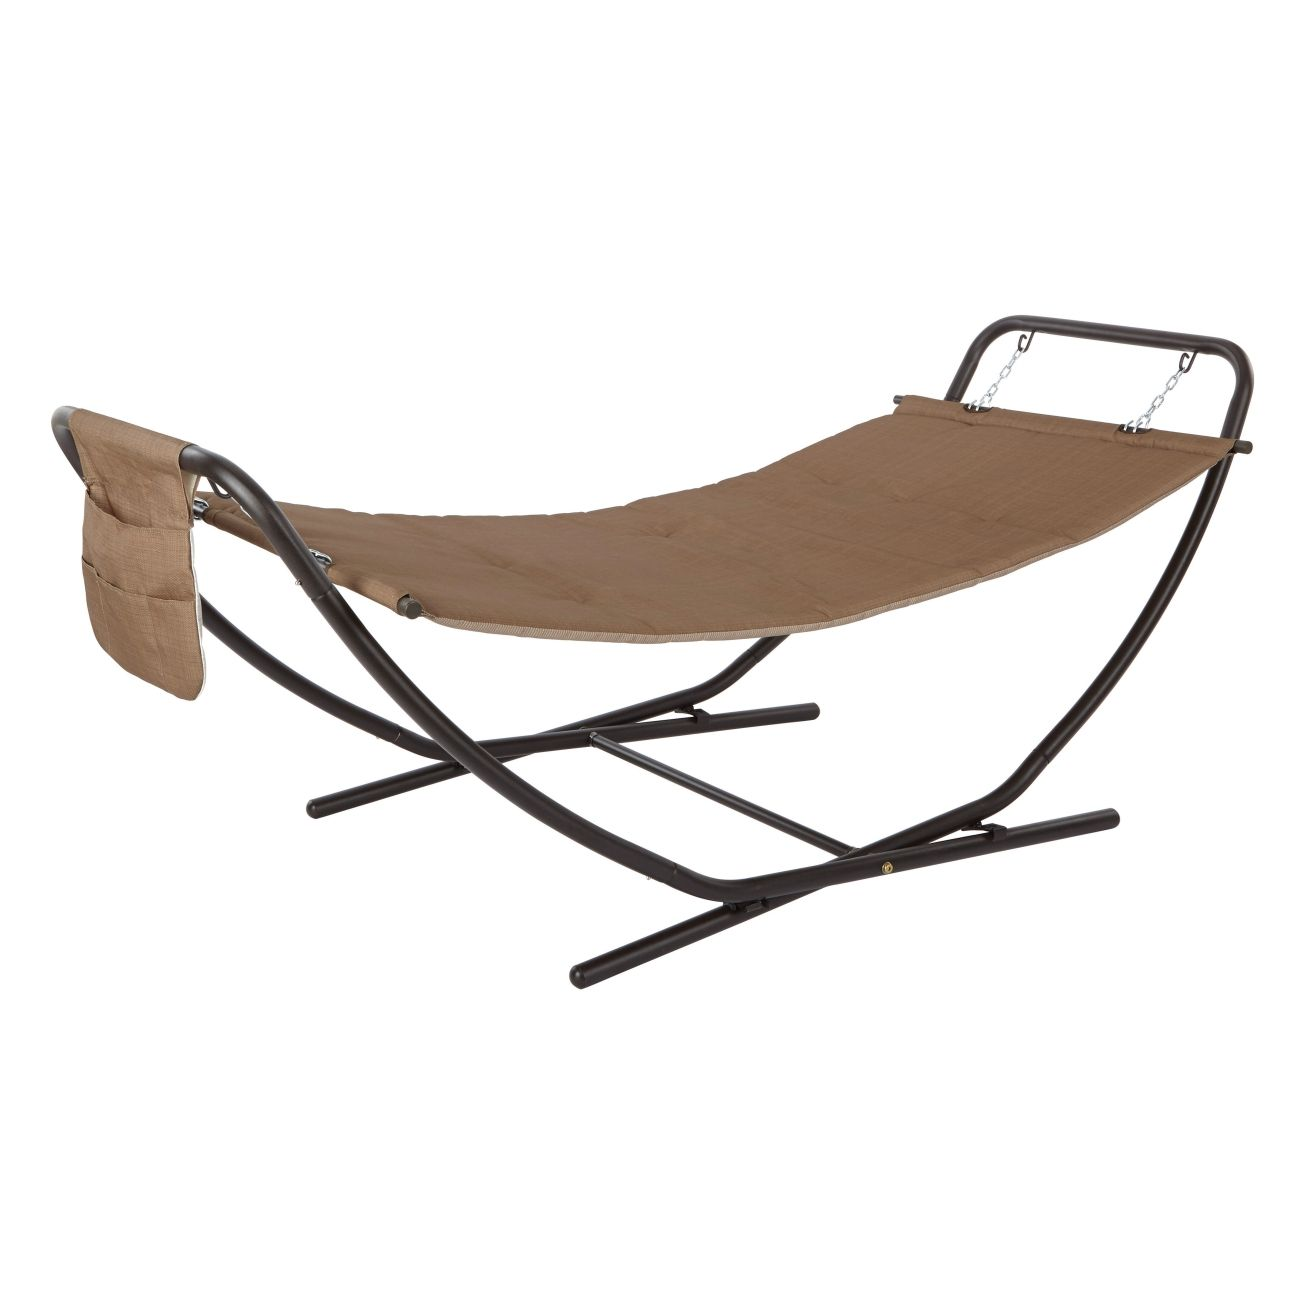 living accents newport hammock and stand kus2312 hammocks